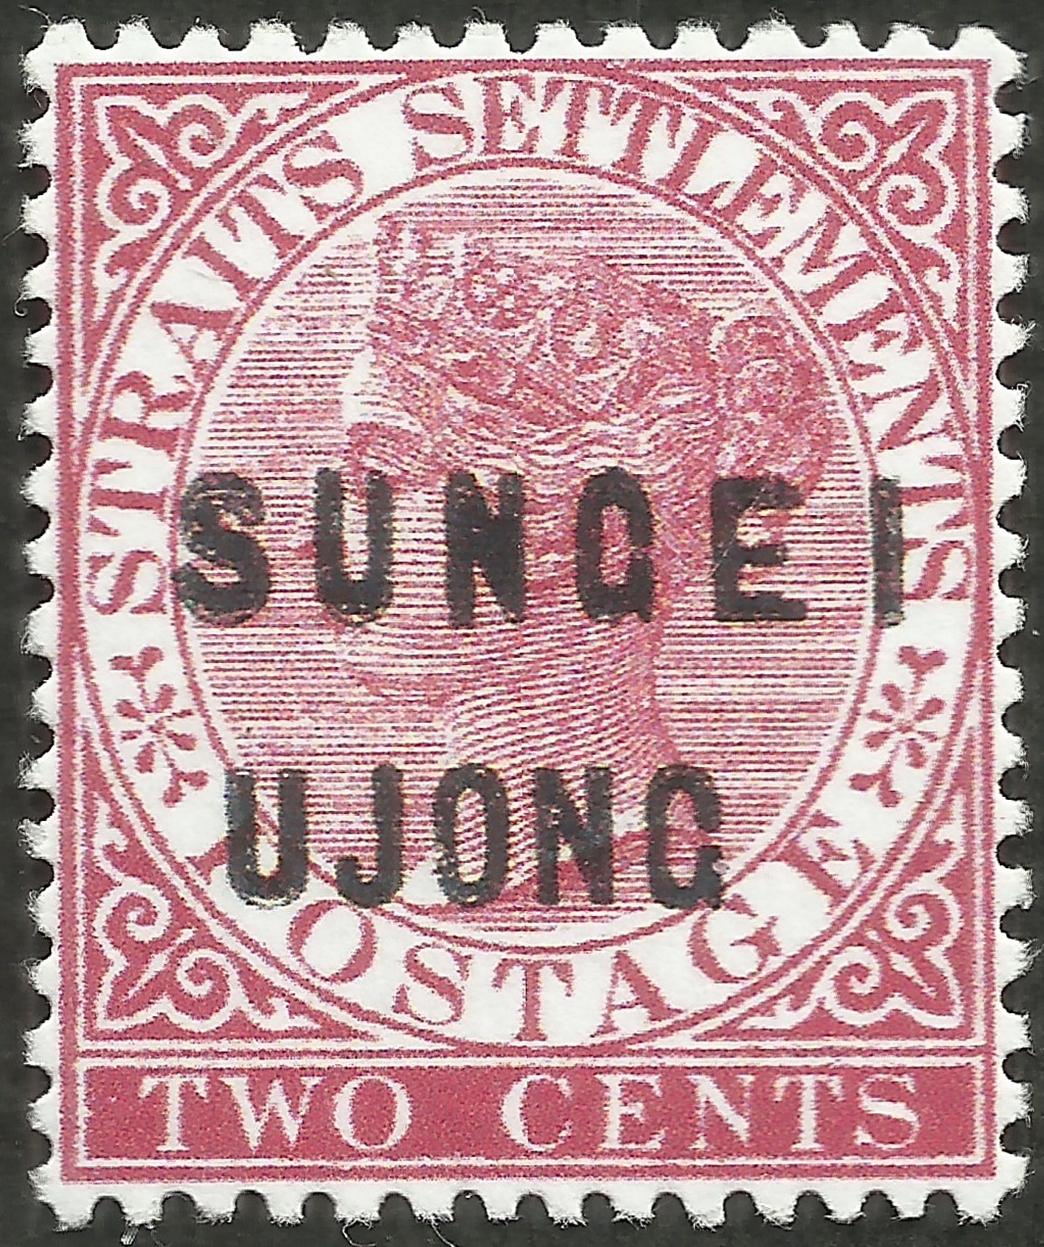 Sungei Ujong - Scott #15 (1881) - probable forgery